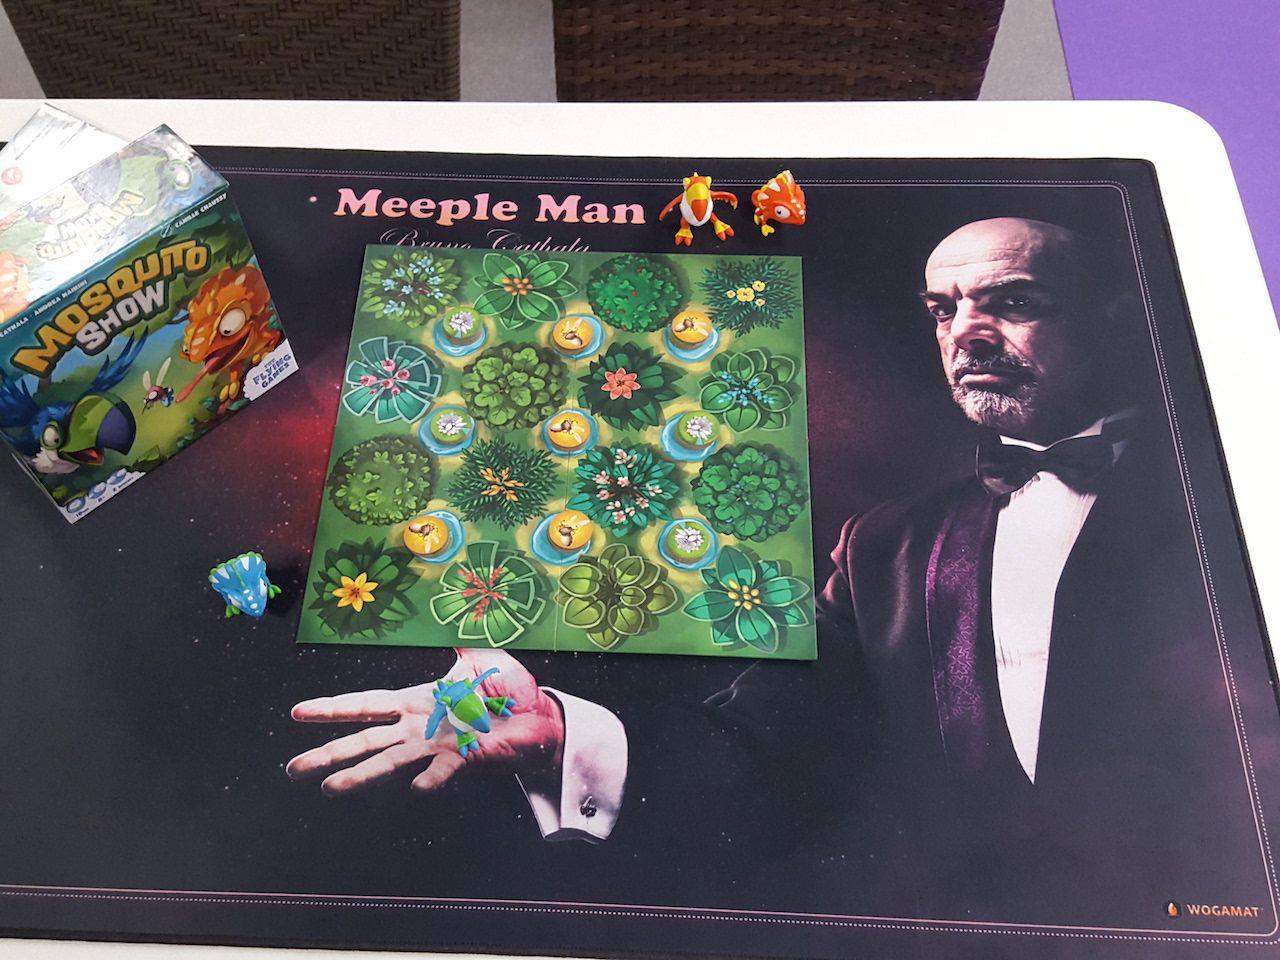 Le Wogomat Cathala au service de Mosquito Show chez The Flying Games.